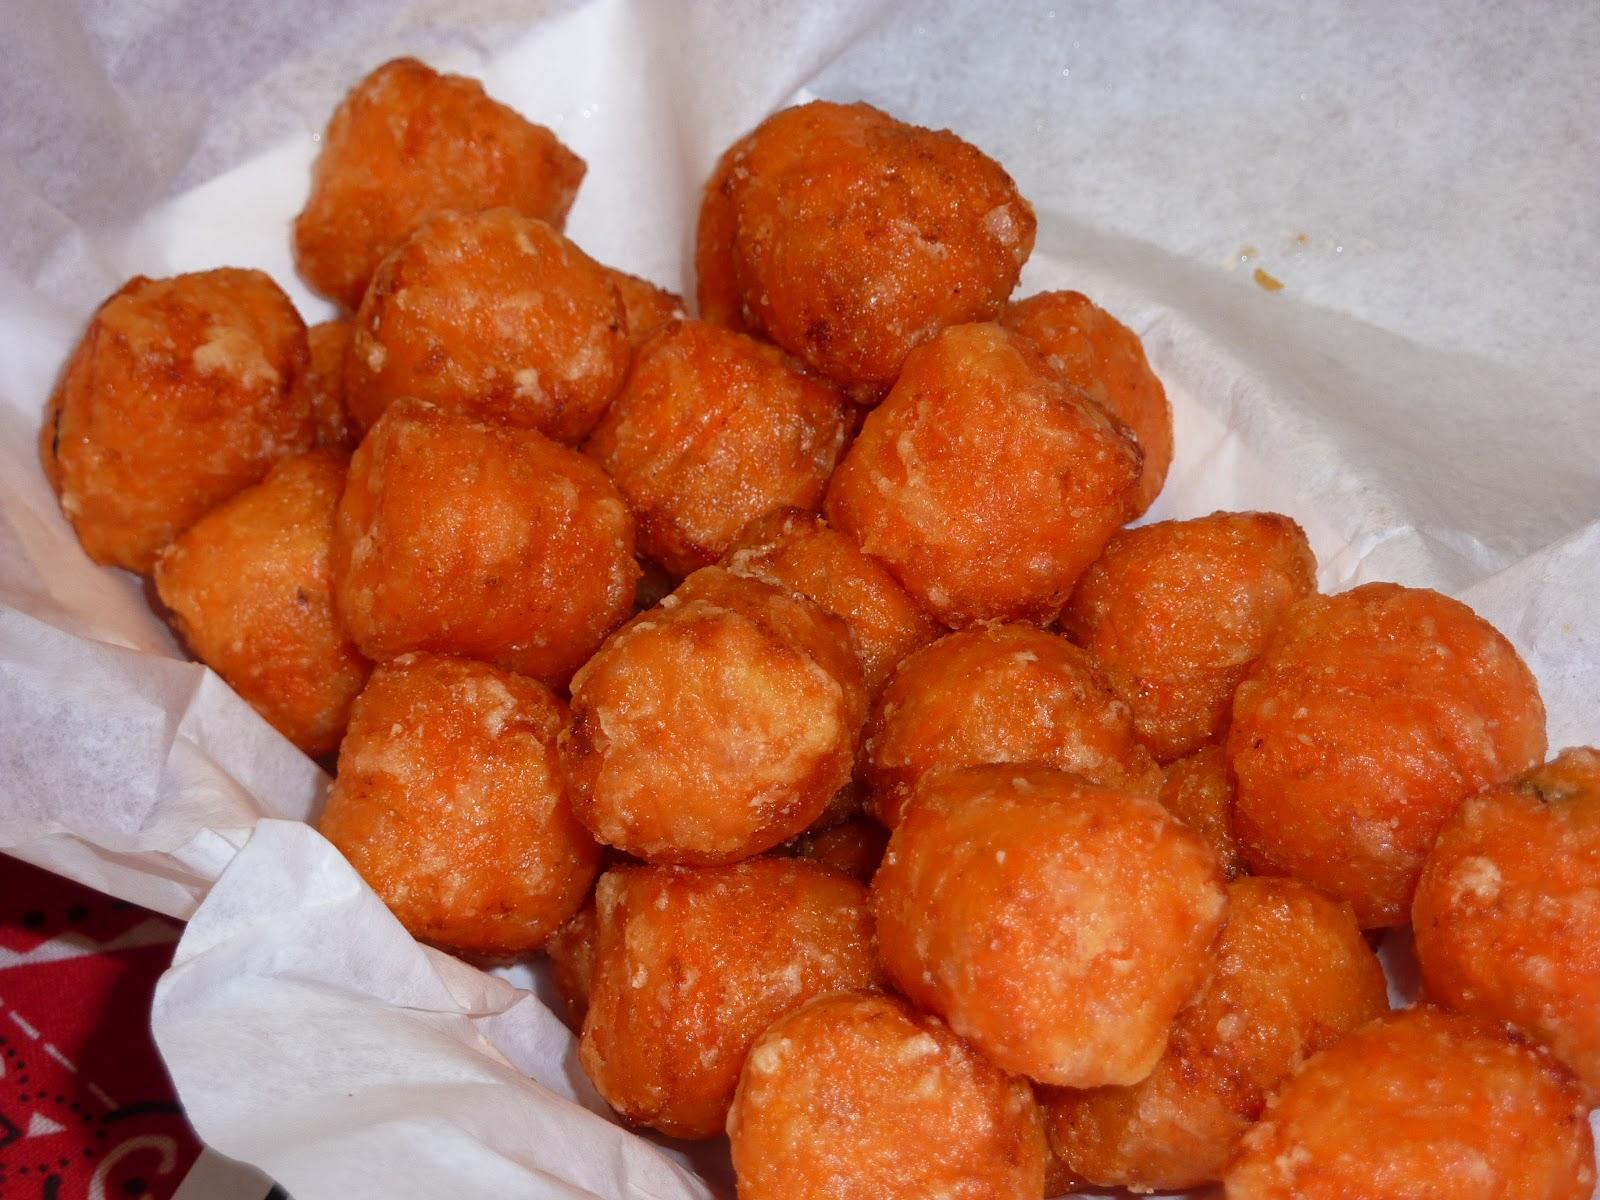 Holly's Diner: Fair Food Favorites - Sweet Potato Tater Tots